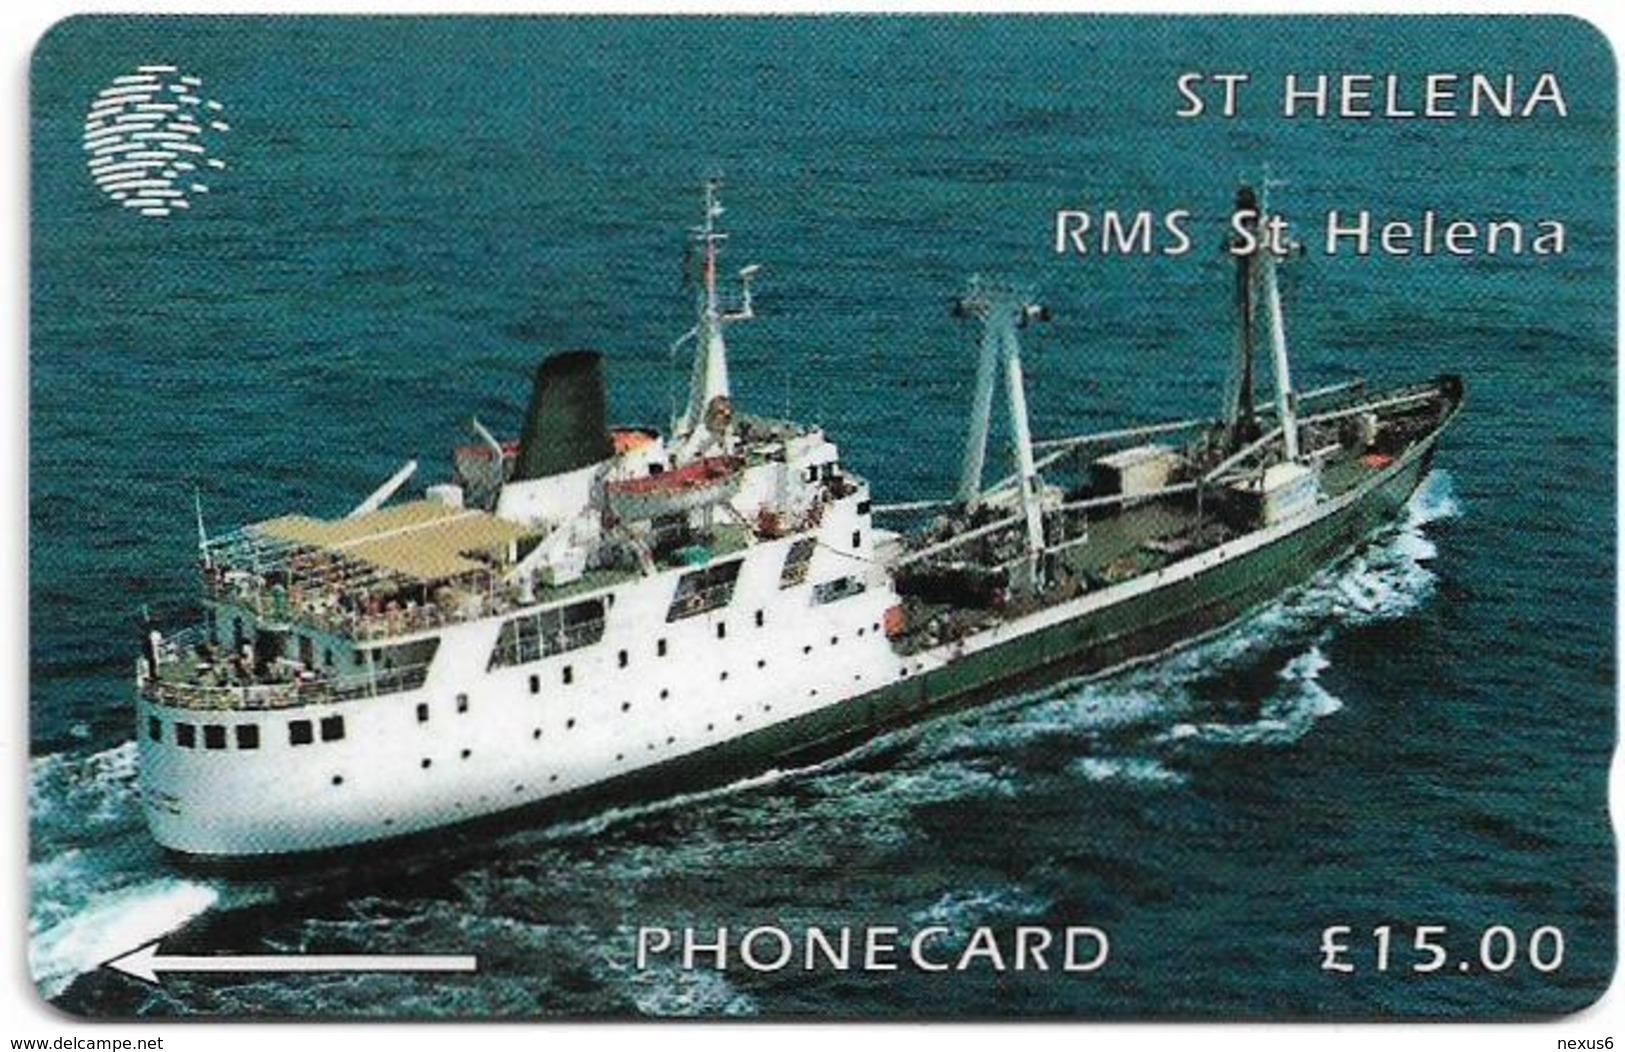 St. Helena - C&W - GPT - Ships - R.M.S. St. Helena (1977-1990) - 5CSHC (Dashed Ø), 1.500ex, Used - Isla Santa Helena